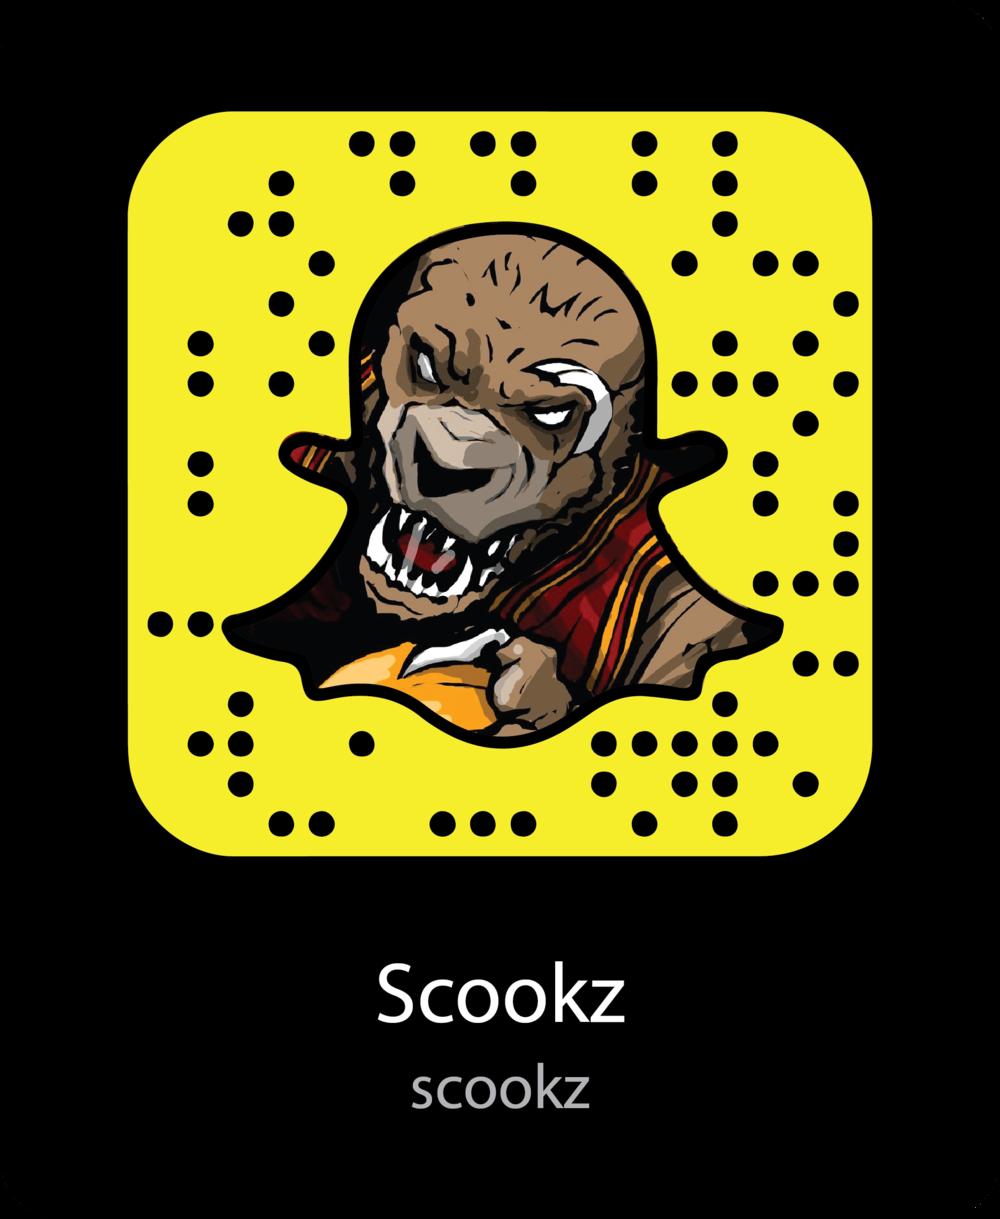 scookz-artists-snapchat-snapcode